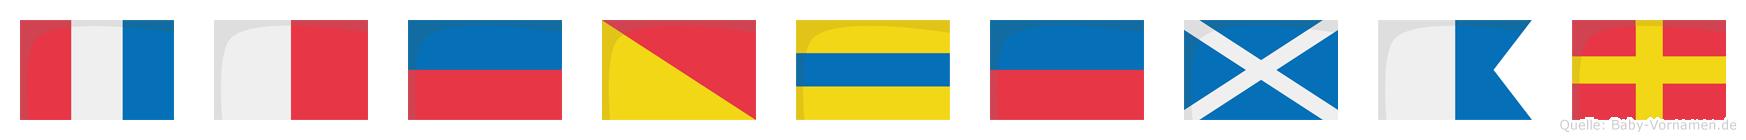 Theodemar im Flaggenalphabet